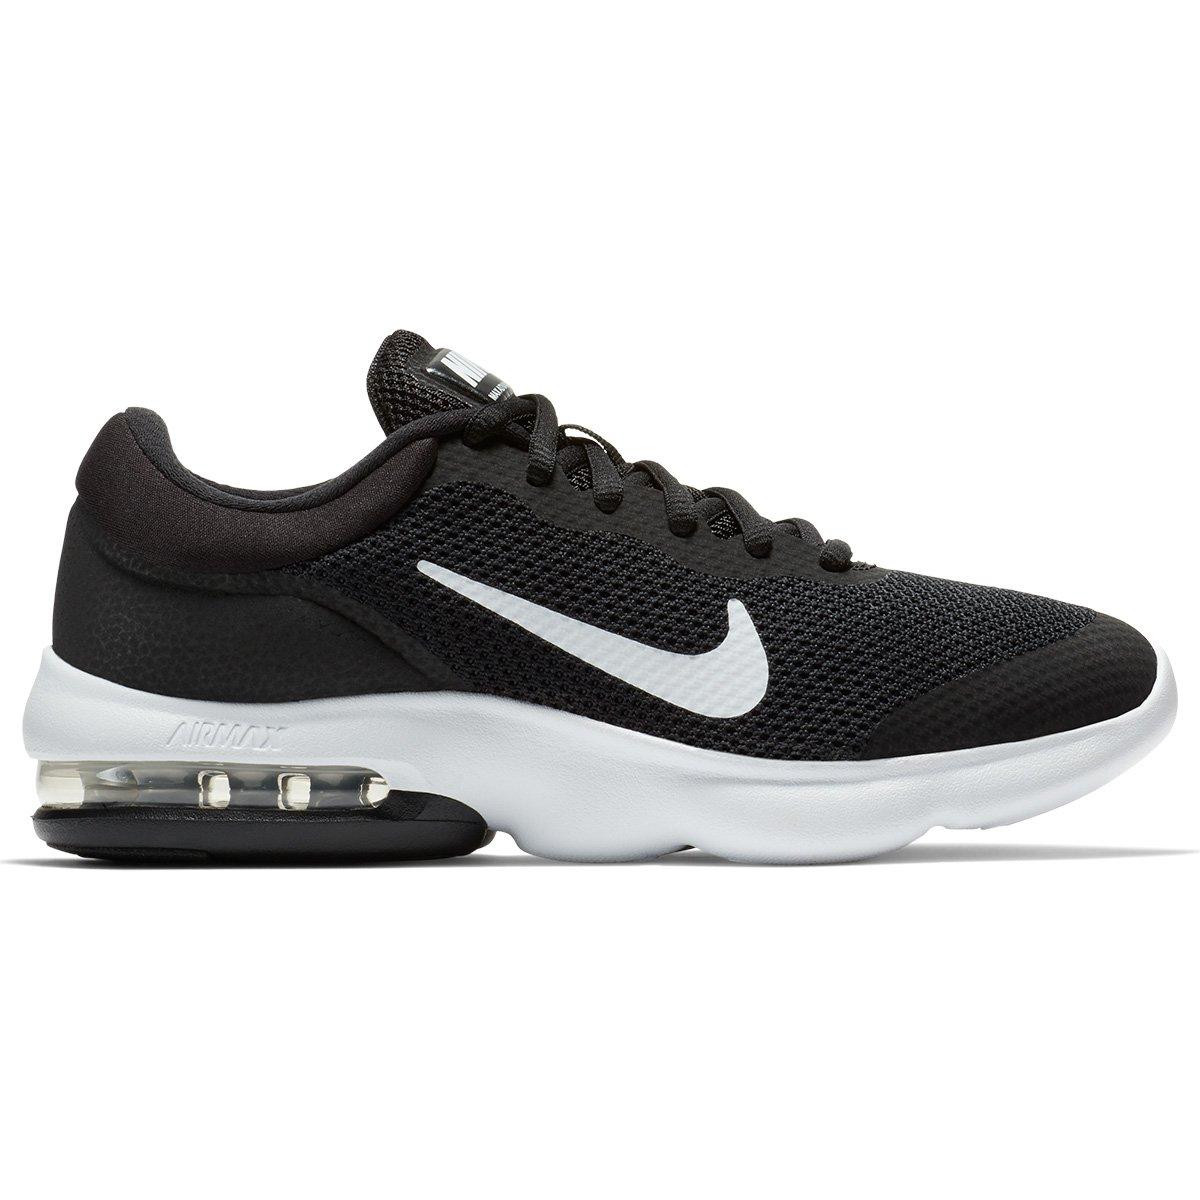 9f6c707ed Tênis Nike Air Max Advantage Feminino - Compre Agora